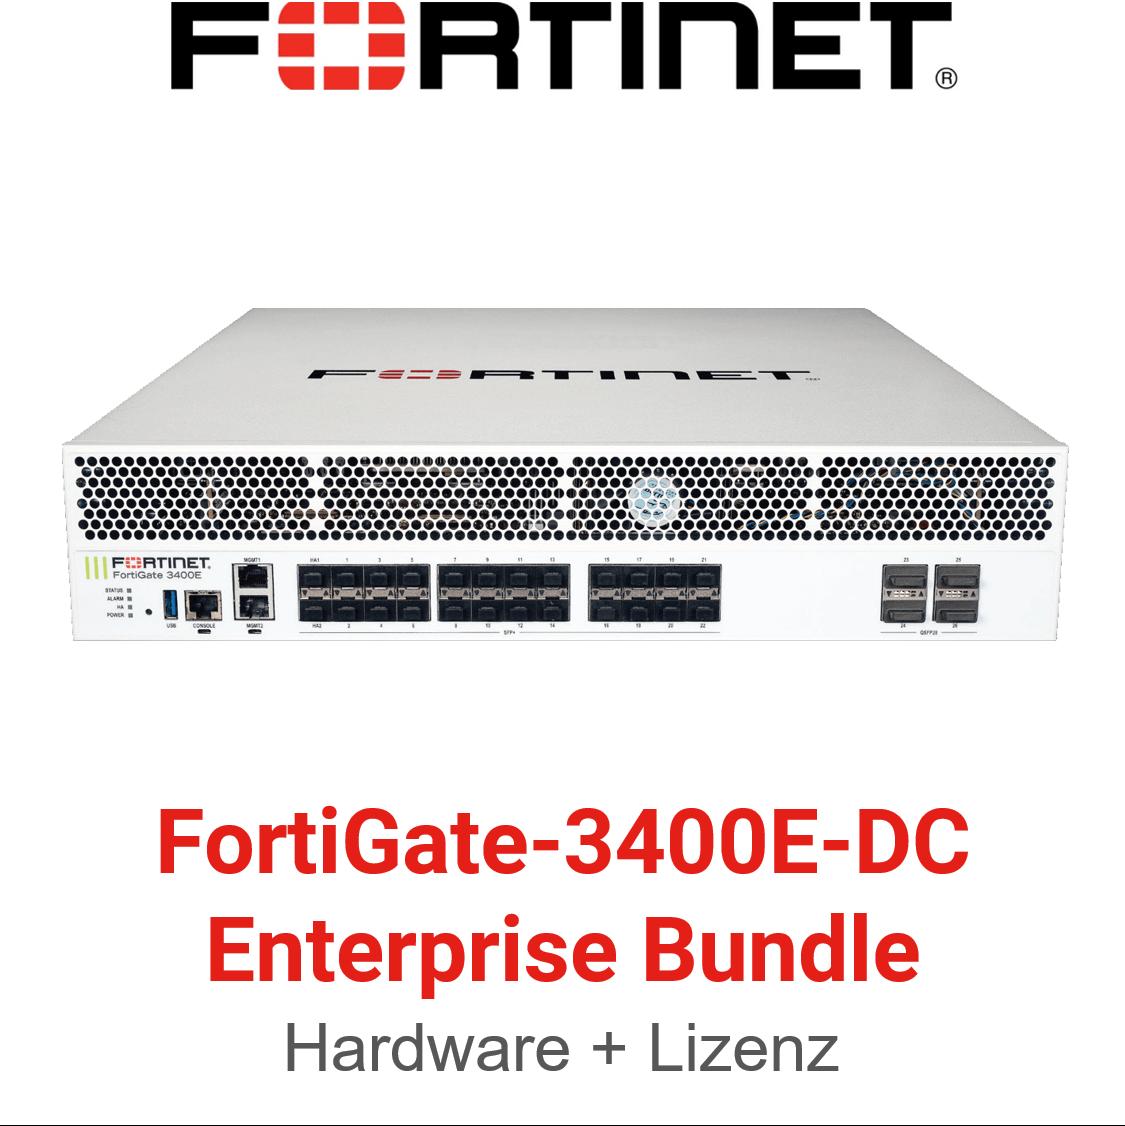 Fortinet FortiGate-3400E-DC 360 Protection Bundle